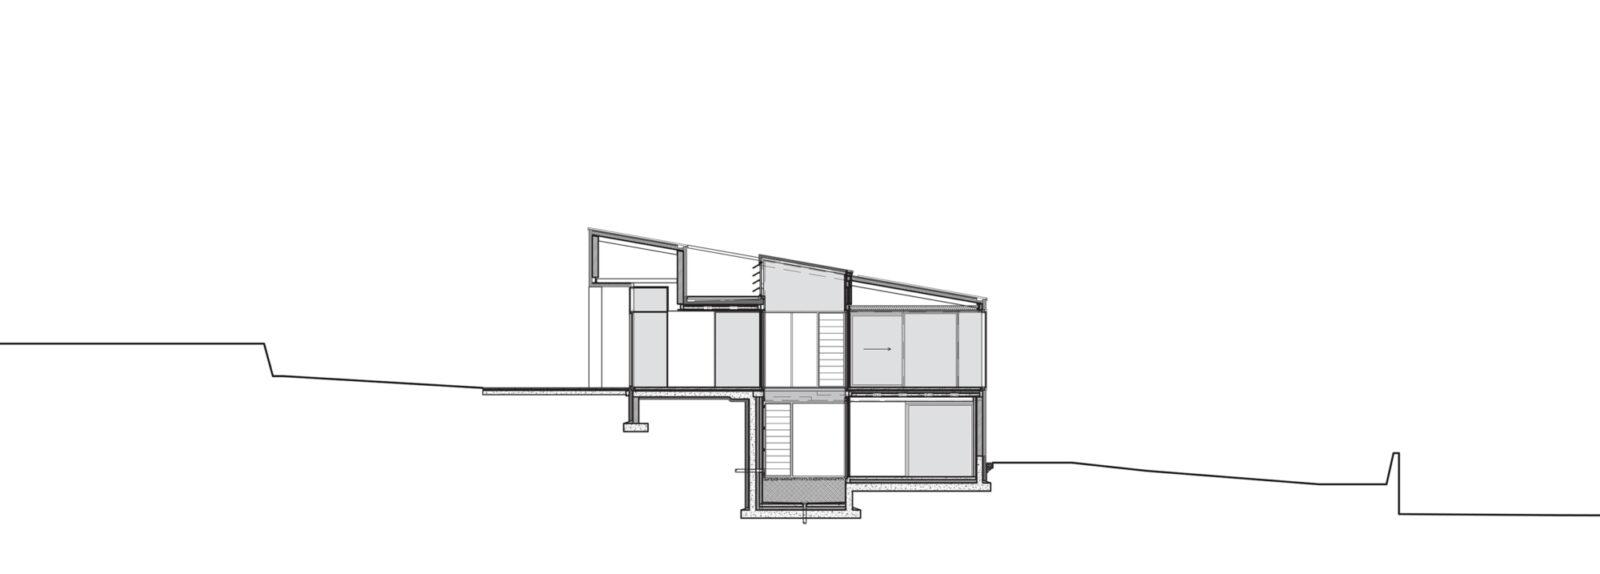 Section C—C